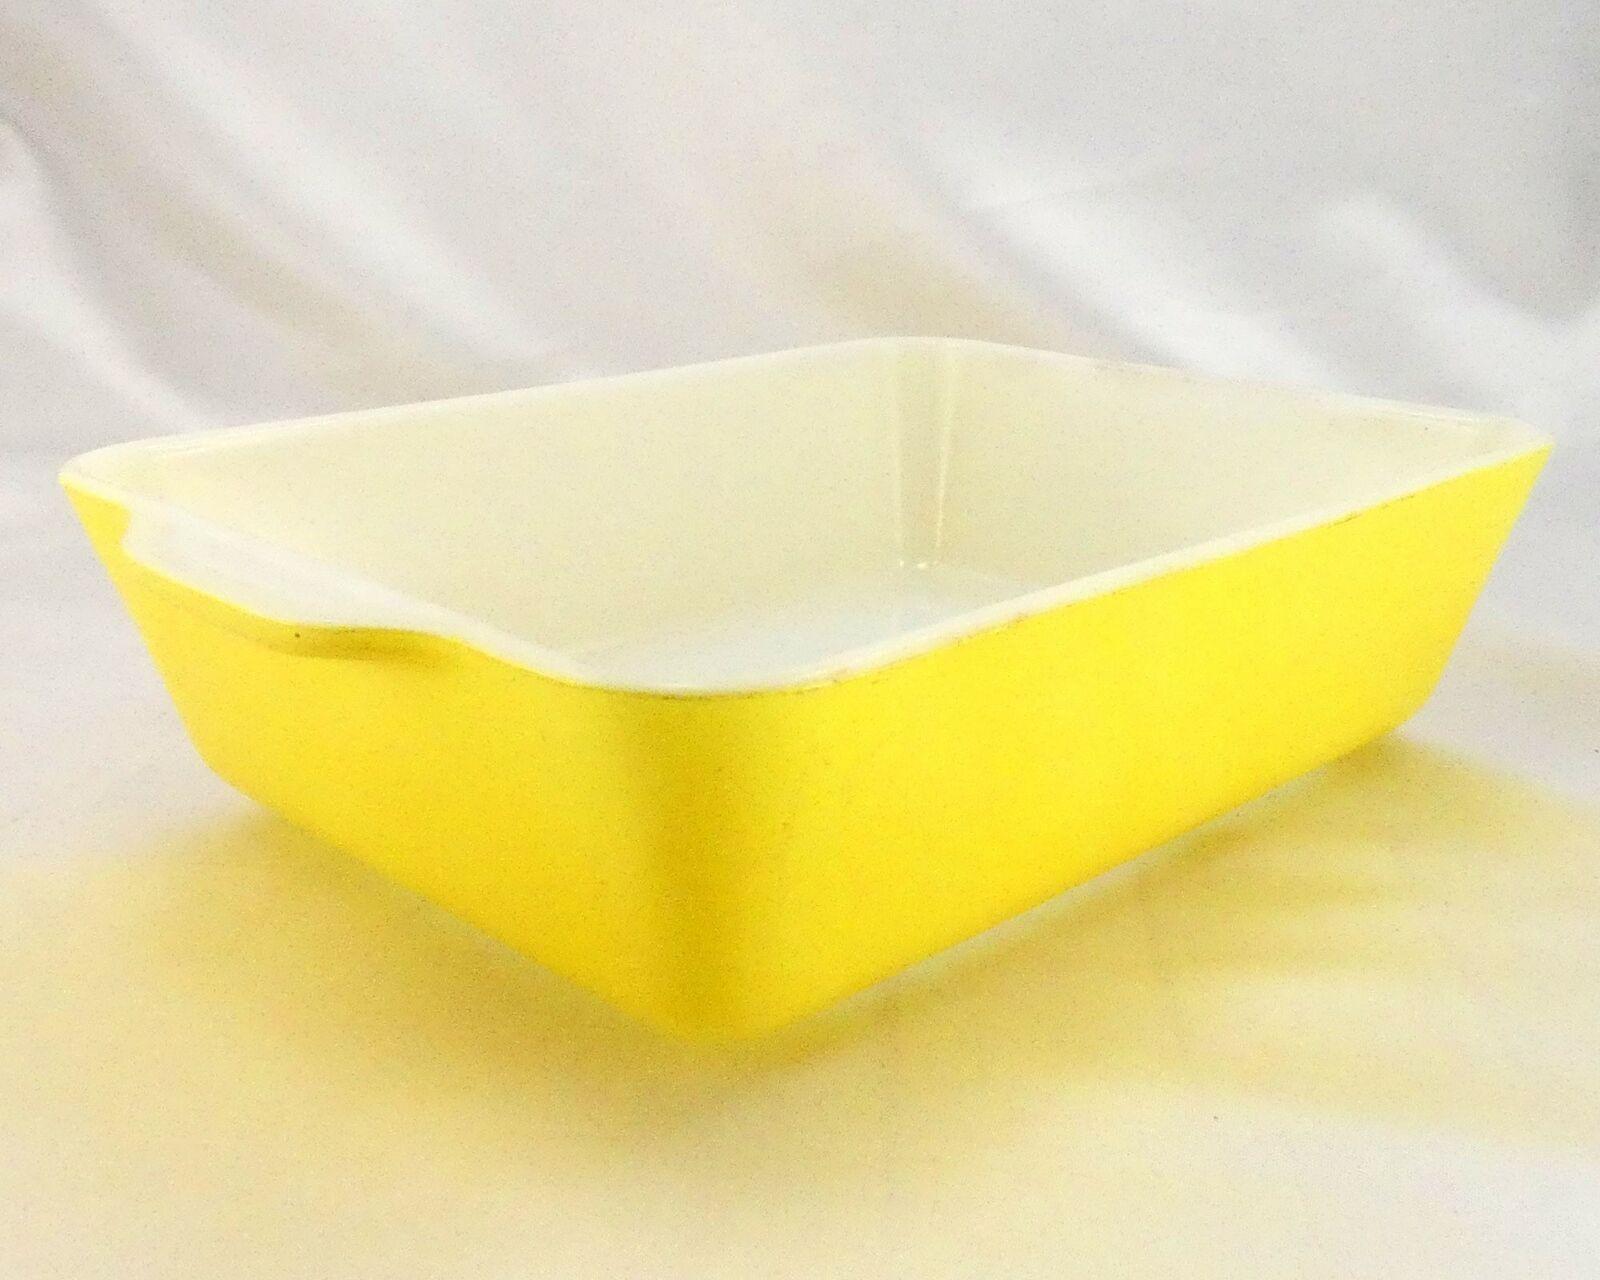 Pyrex 503 Banana Yellow Fridge Dish Milk Glass w/ Lid Made in the USA image 3